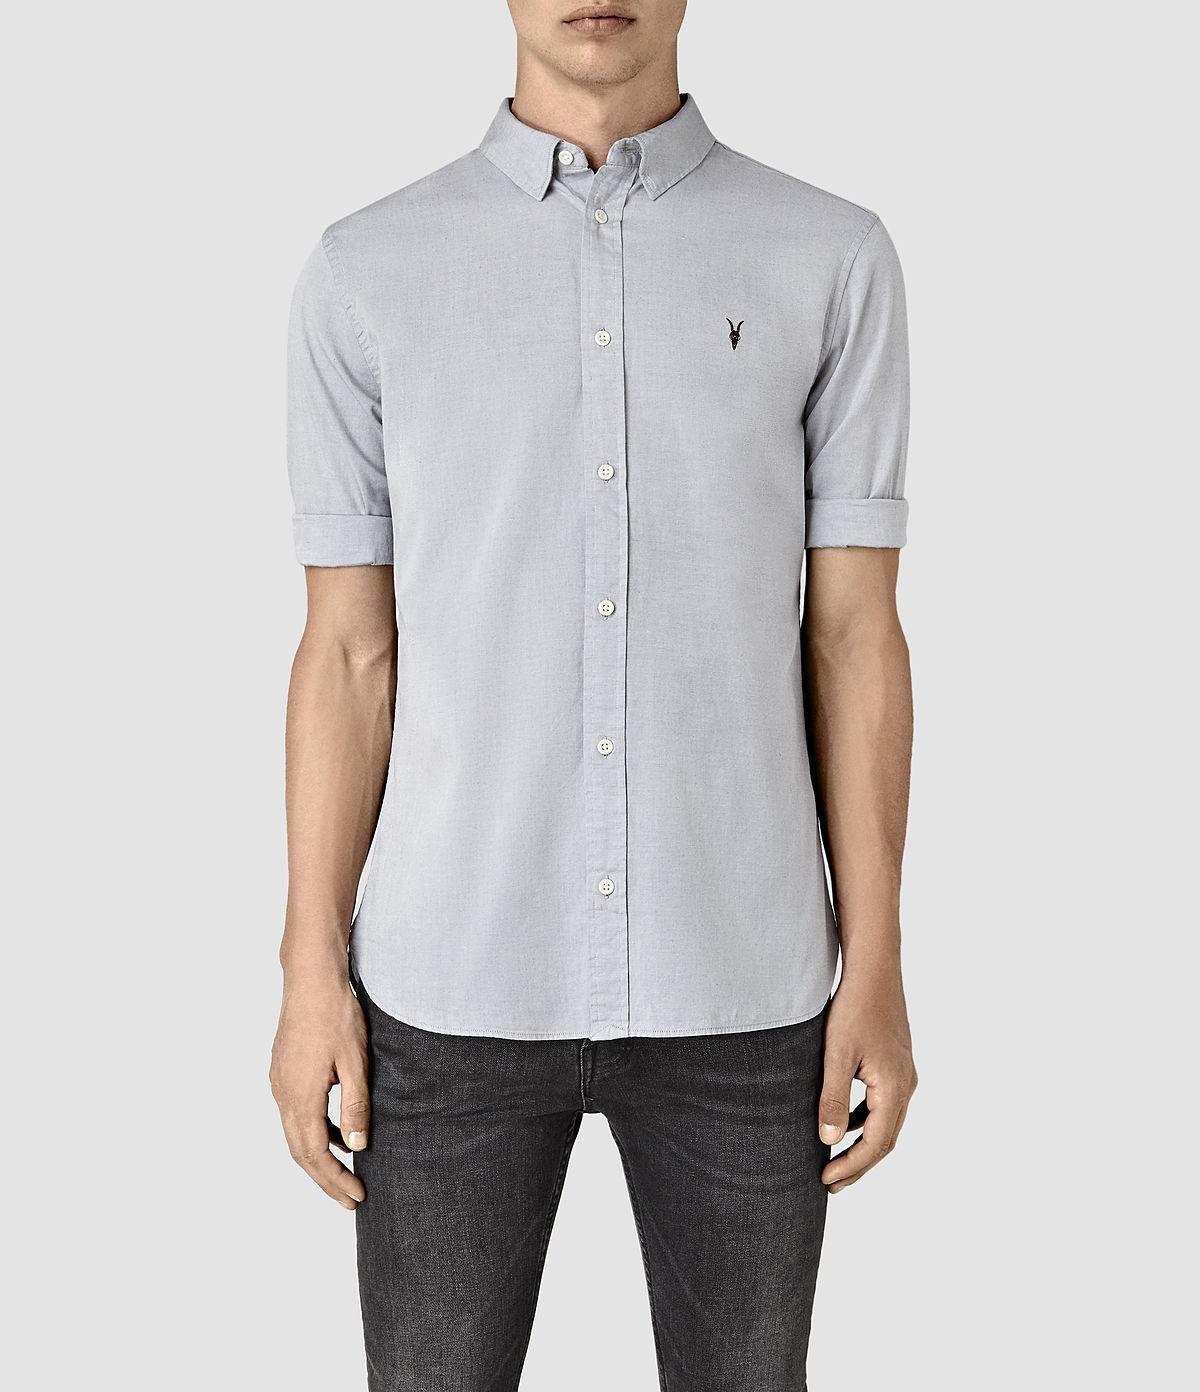 Allsaints half sleeve shirt